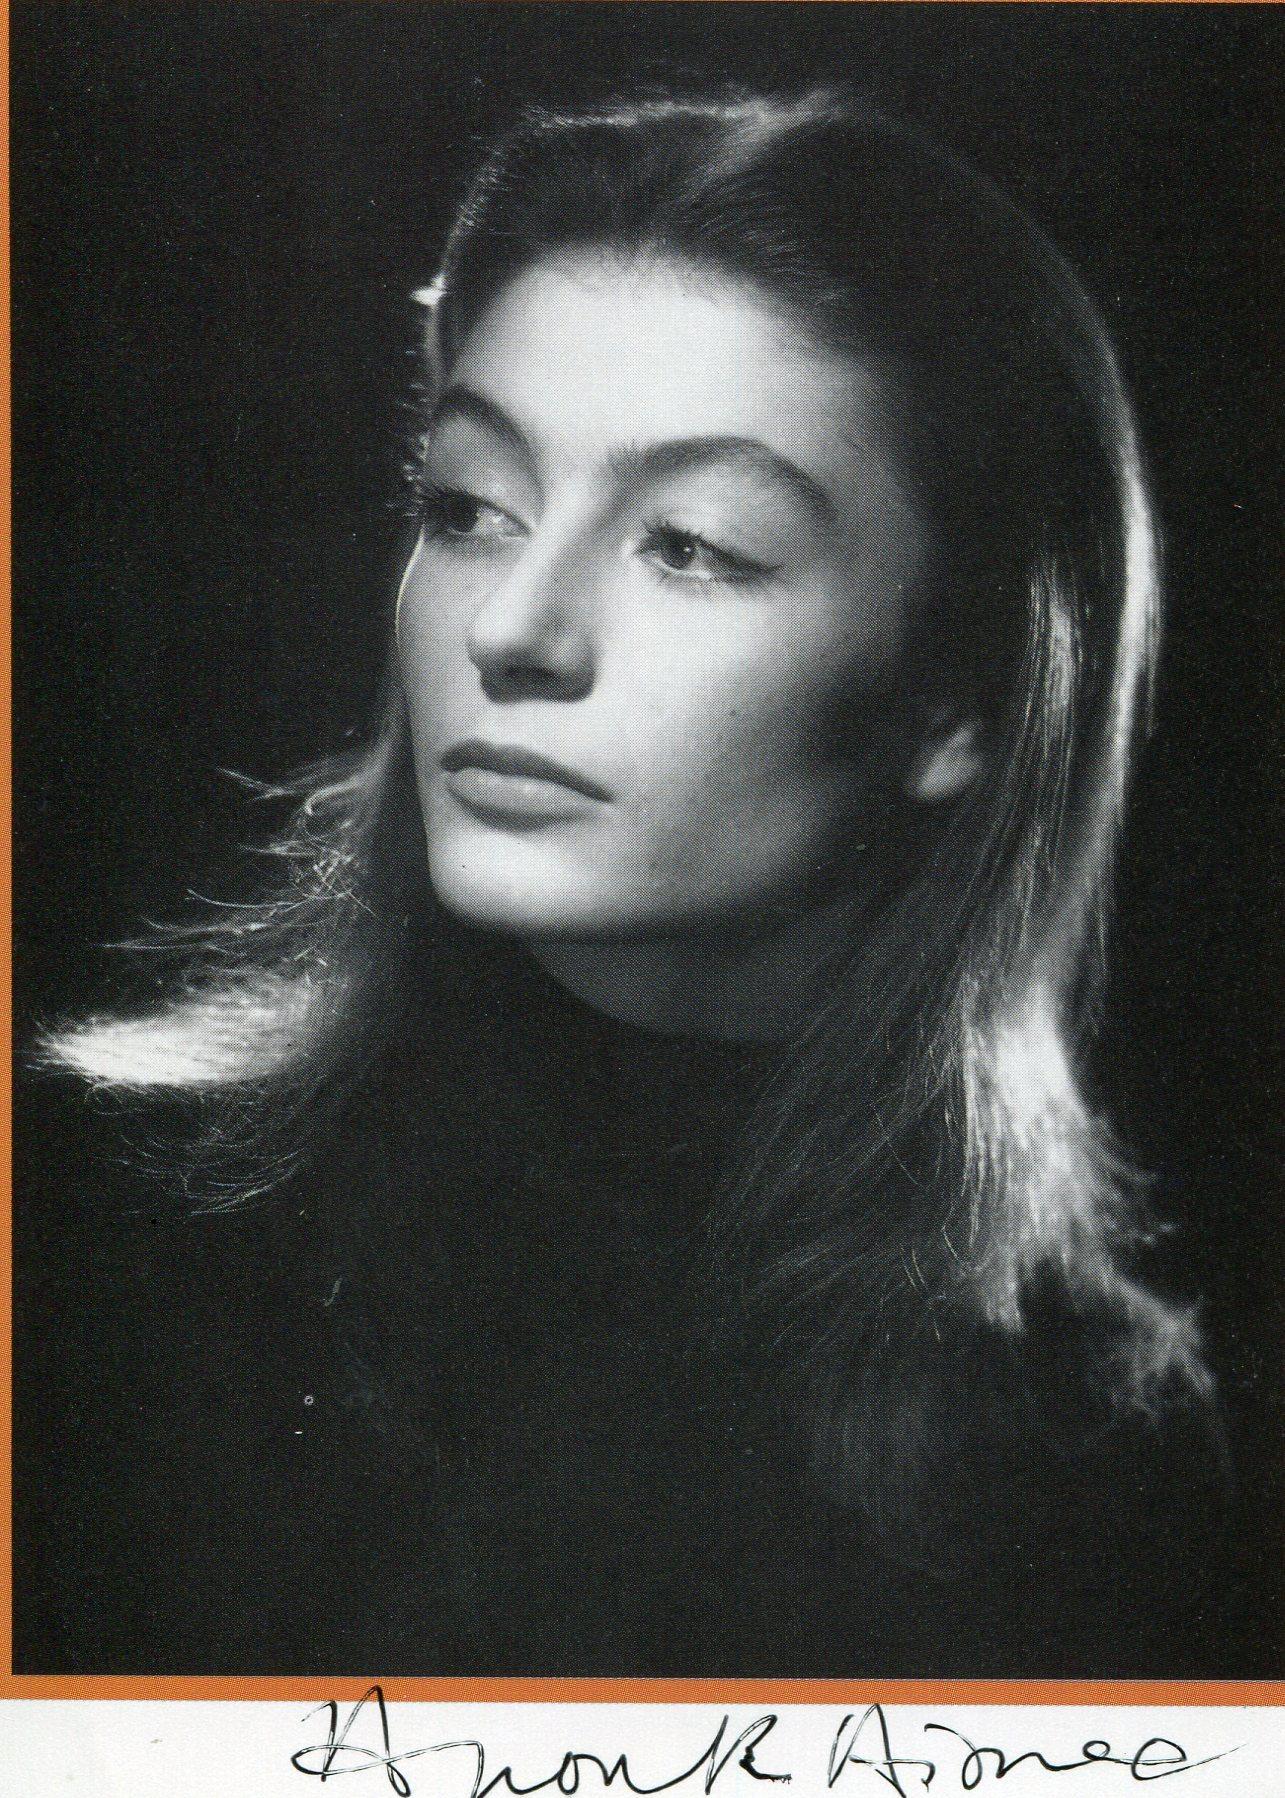 Anouk Aimée Photos anouk aimee - movies & autographed portraits through the